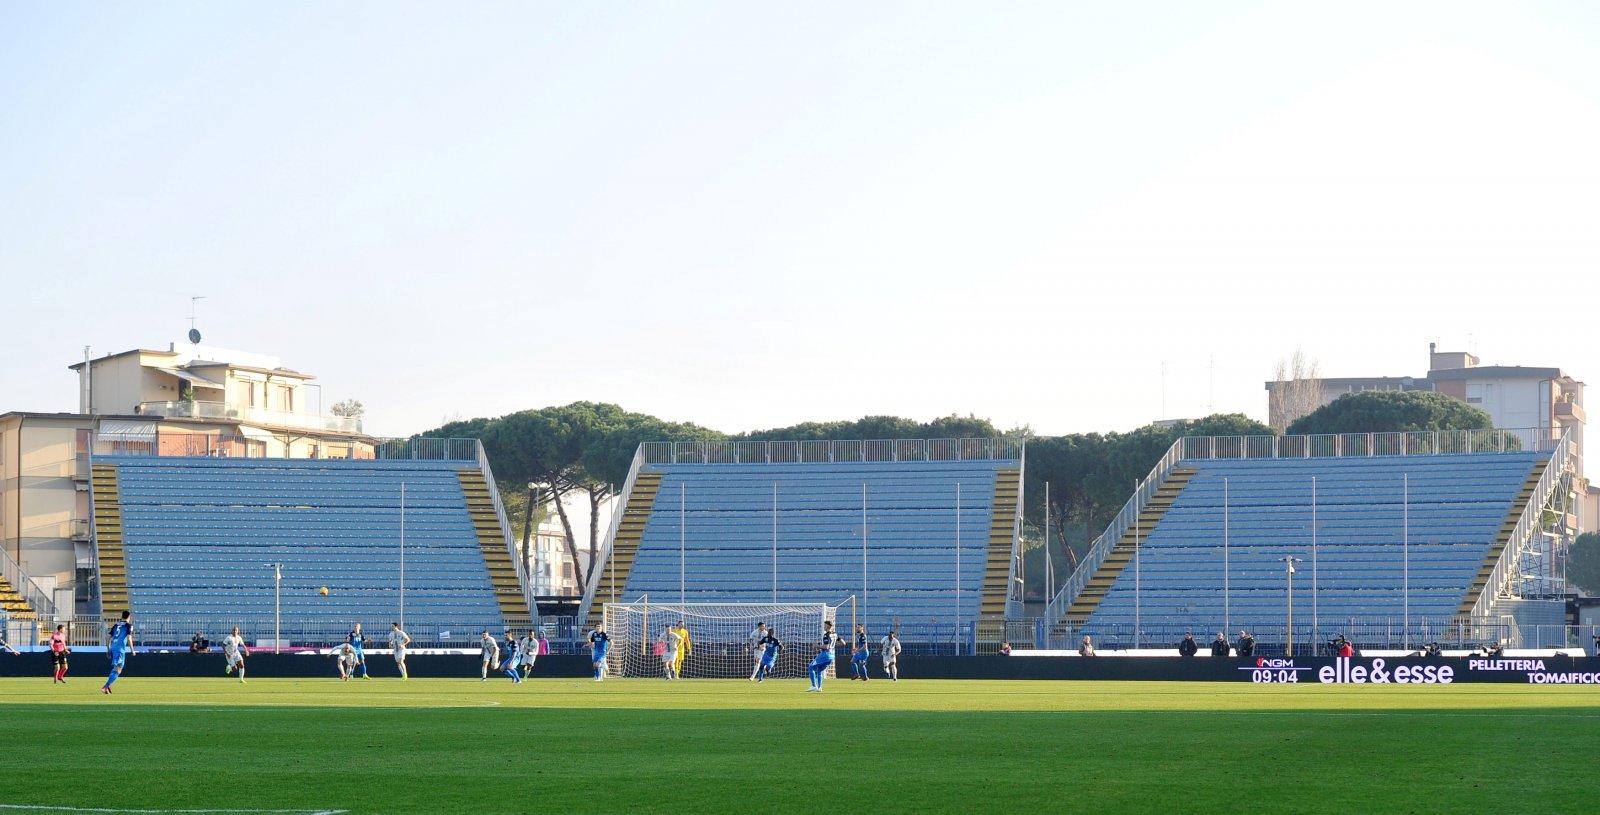 Empoli asciende a la Serie A